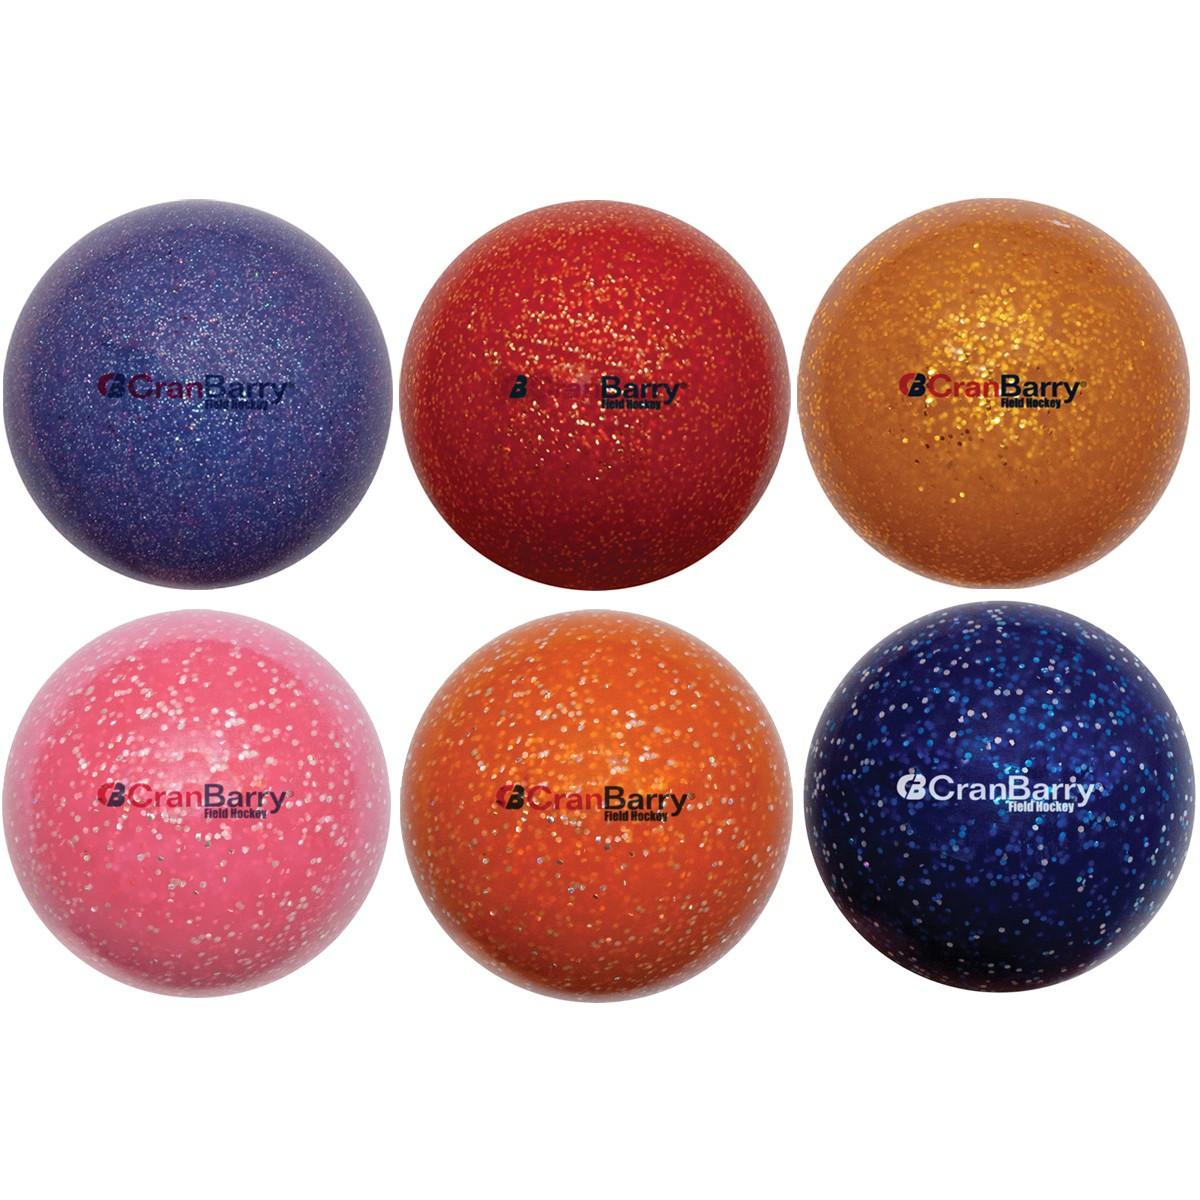 Gymnastics Equipment For Sale >> CranBarry Glitter Practice Field Hockey Ball